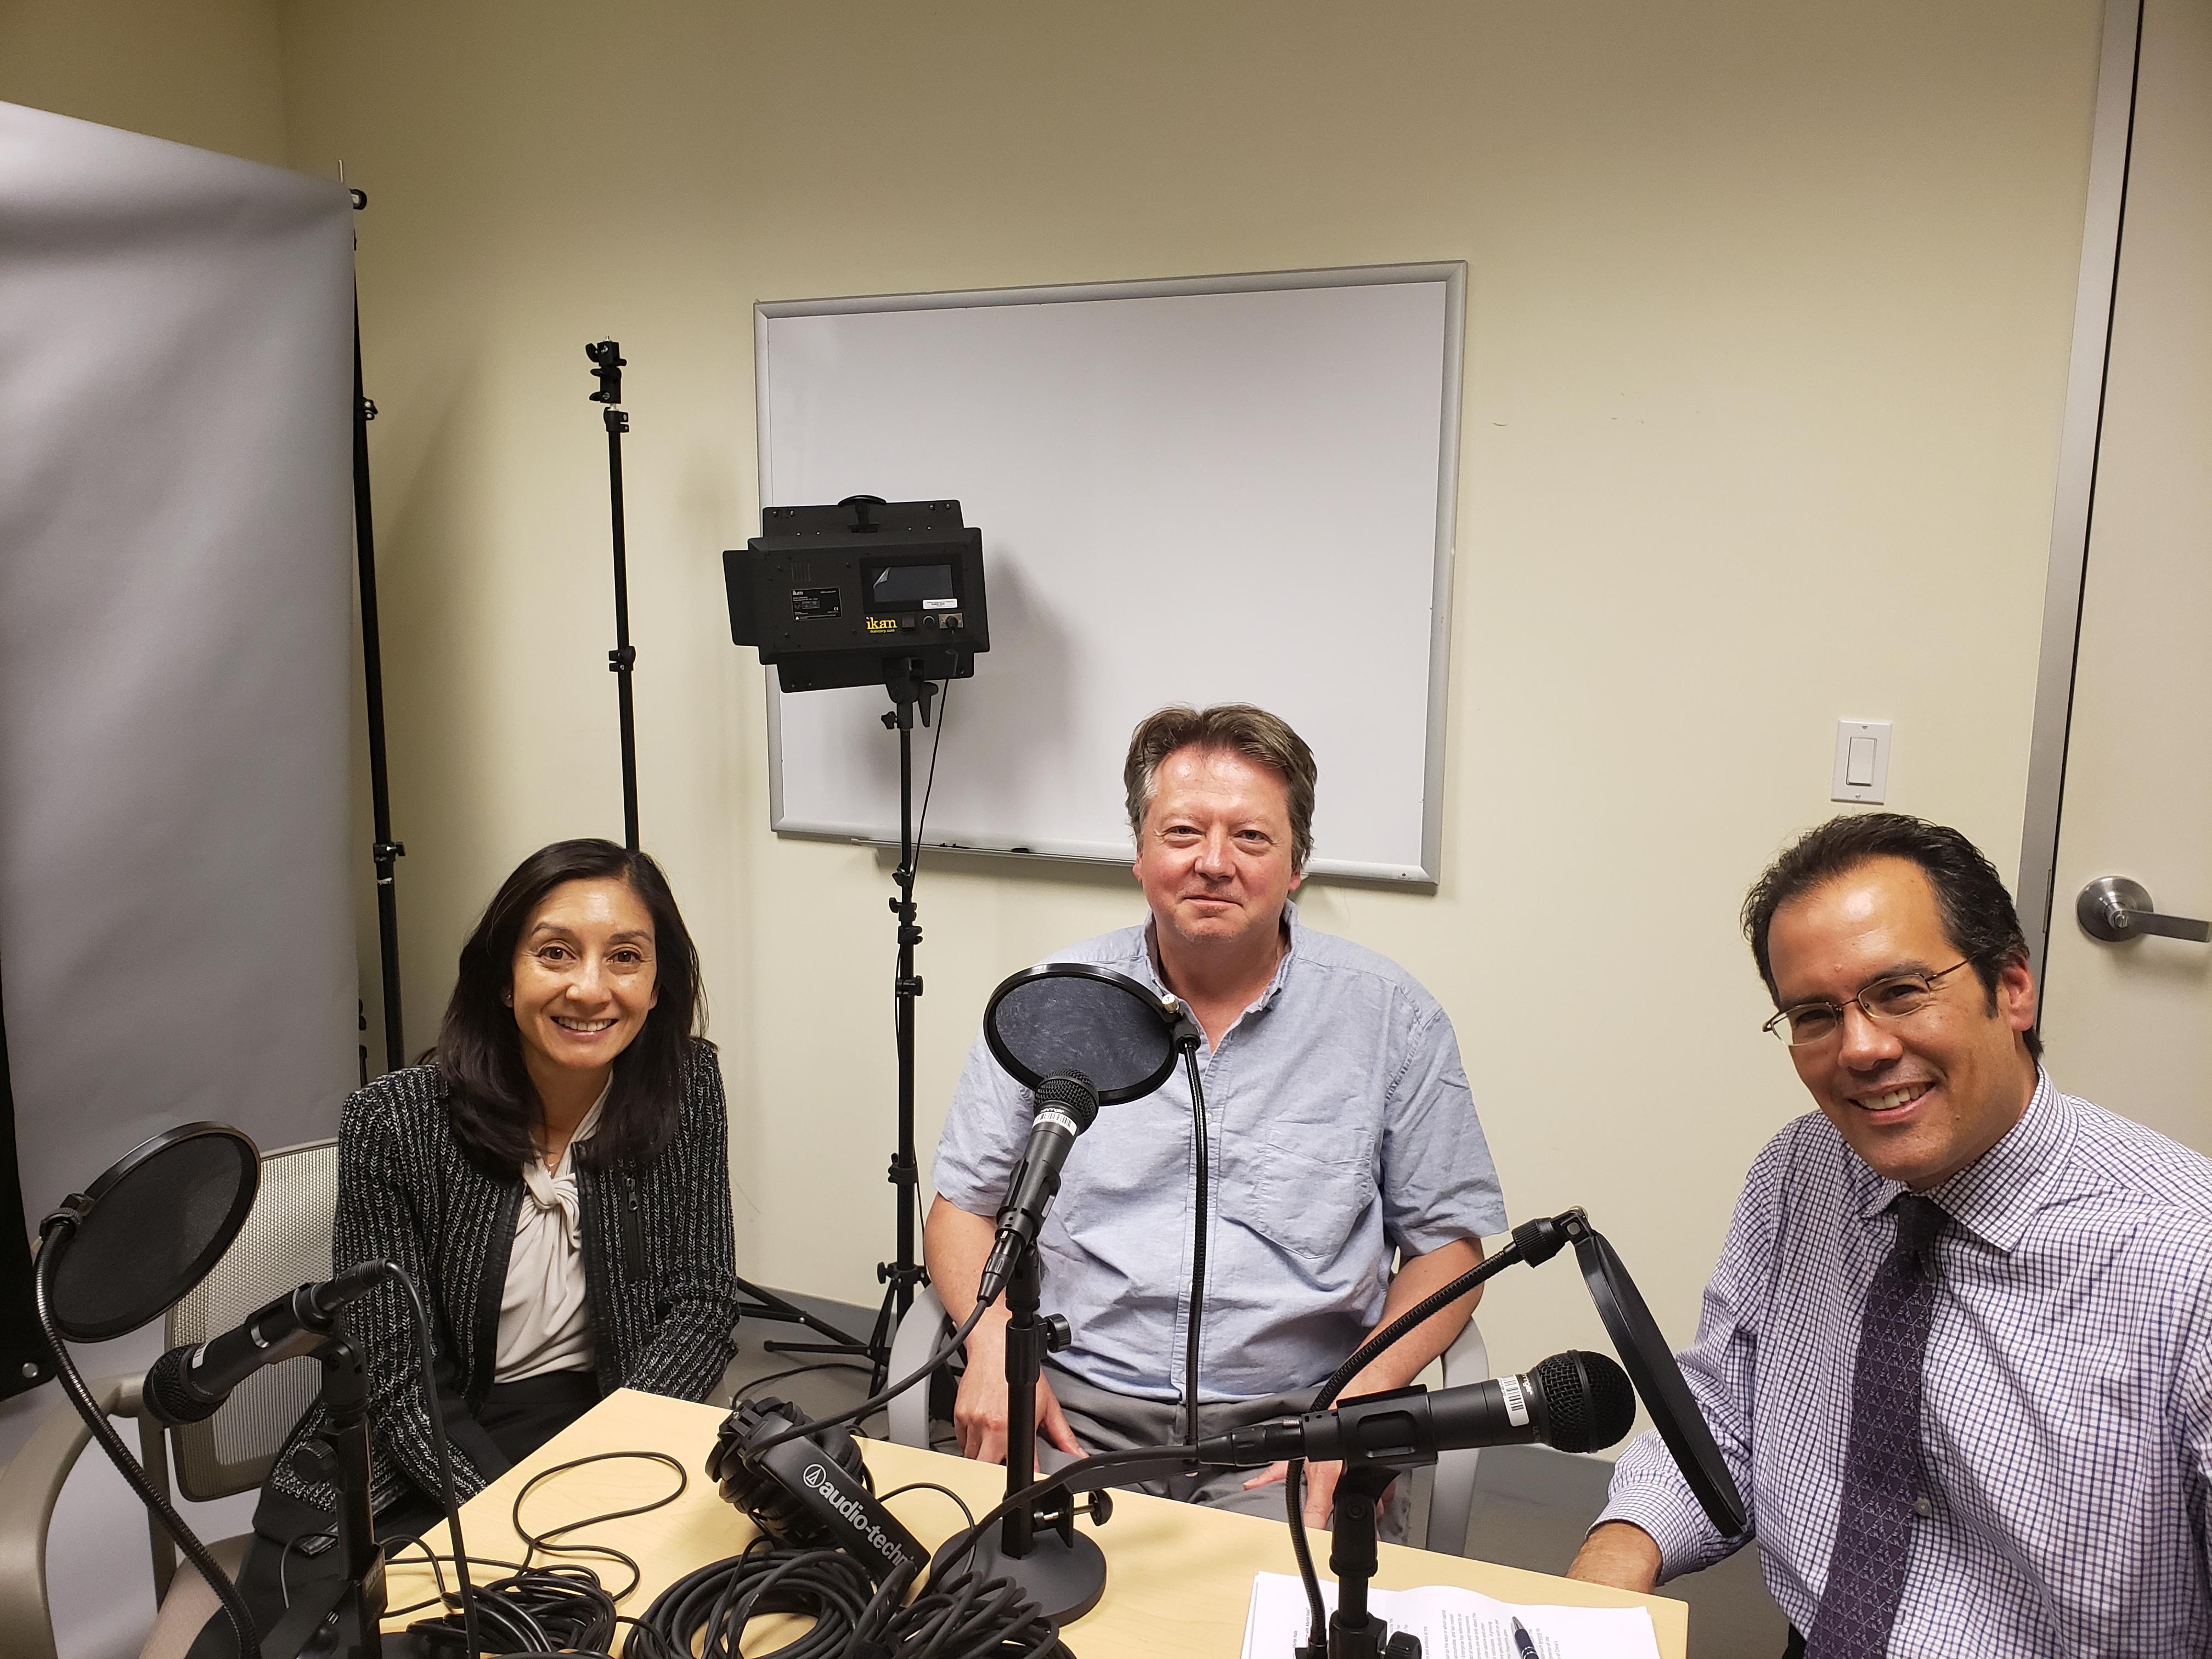 Power 3 0 Podcast | Authoritarian Resurgence, Democratic